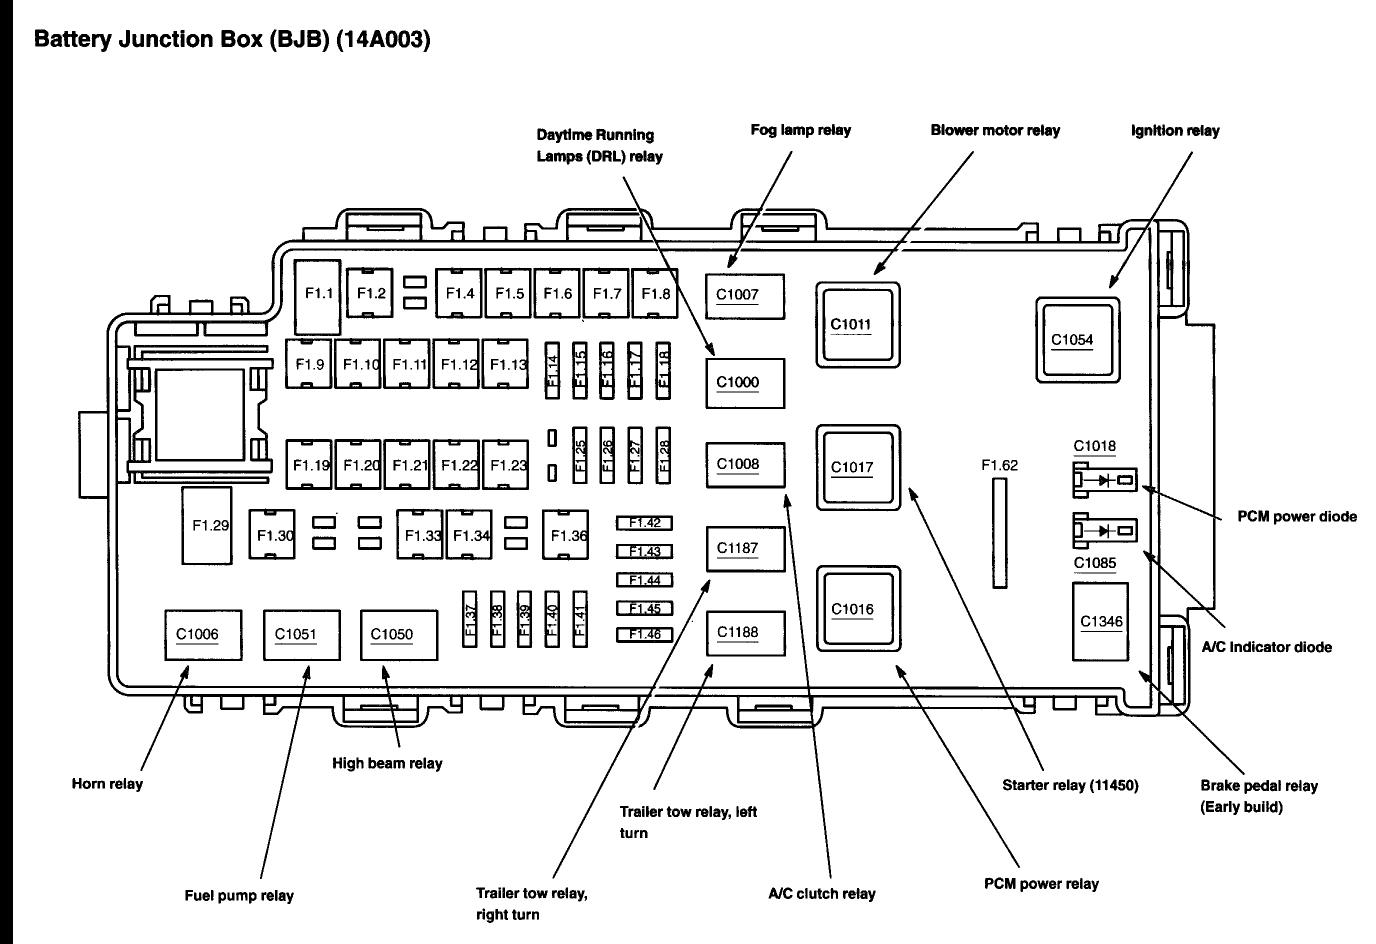 2004 Ford Explorer Fuel Pump Diagram - Wiring Diagrams Hubs - 2002 Ford Explorer Radio Wiring Diagram